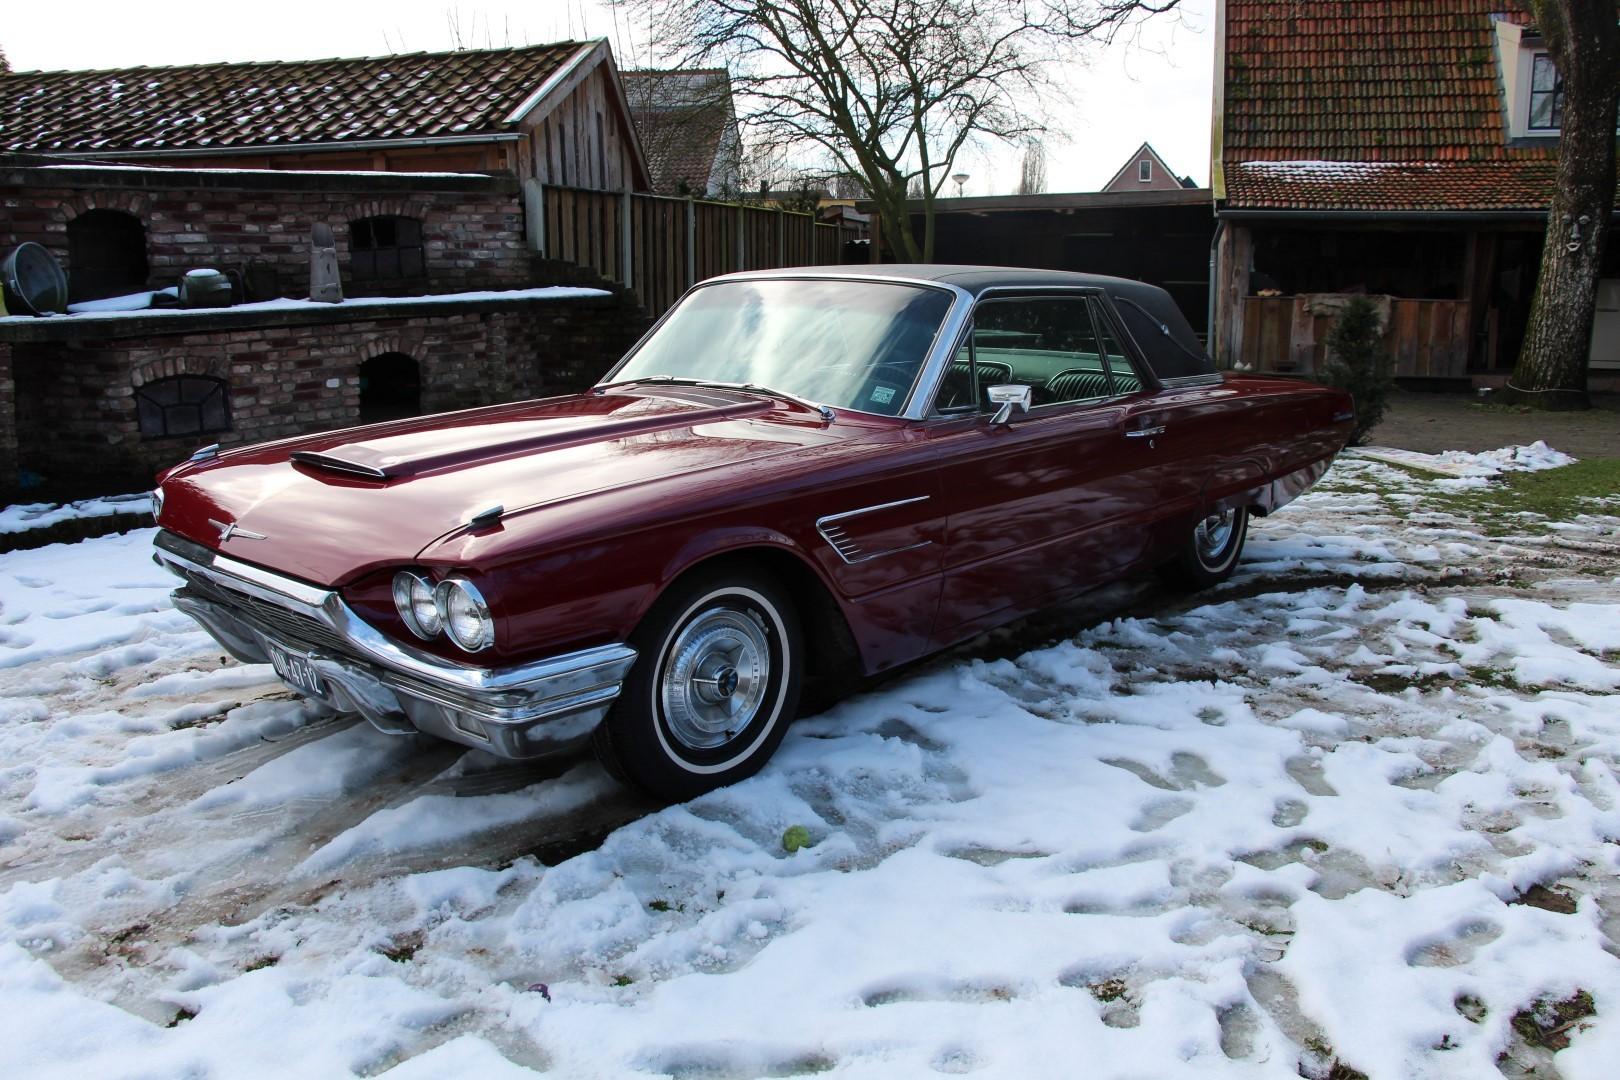 1965 Ford Thunderbird Hardtop - Burgundy new (14)